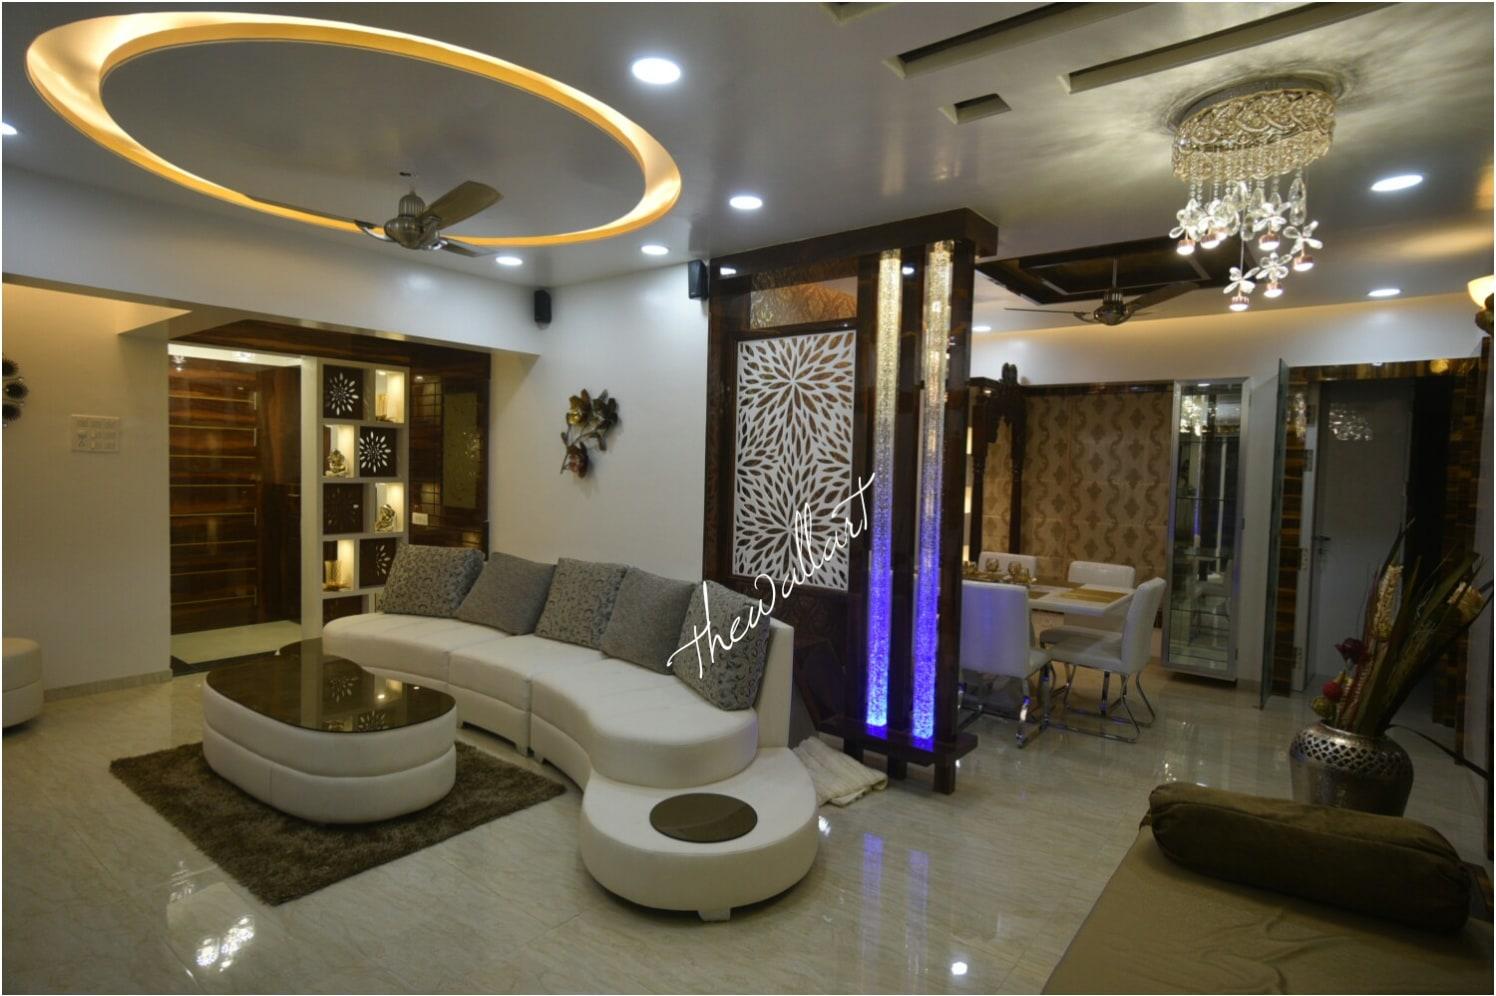 The Art of Living by Simi Jajoo Modern | Interior Design Photos & Ideas